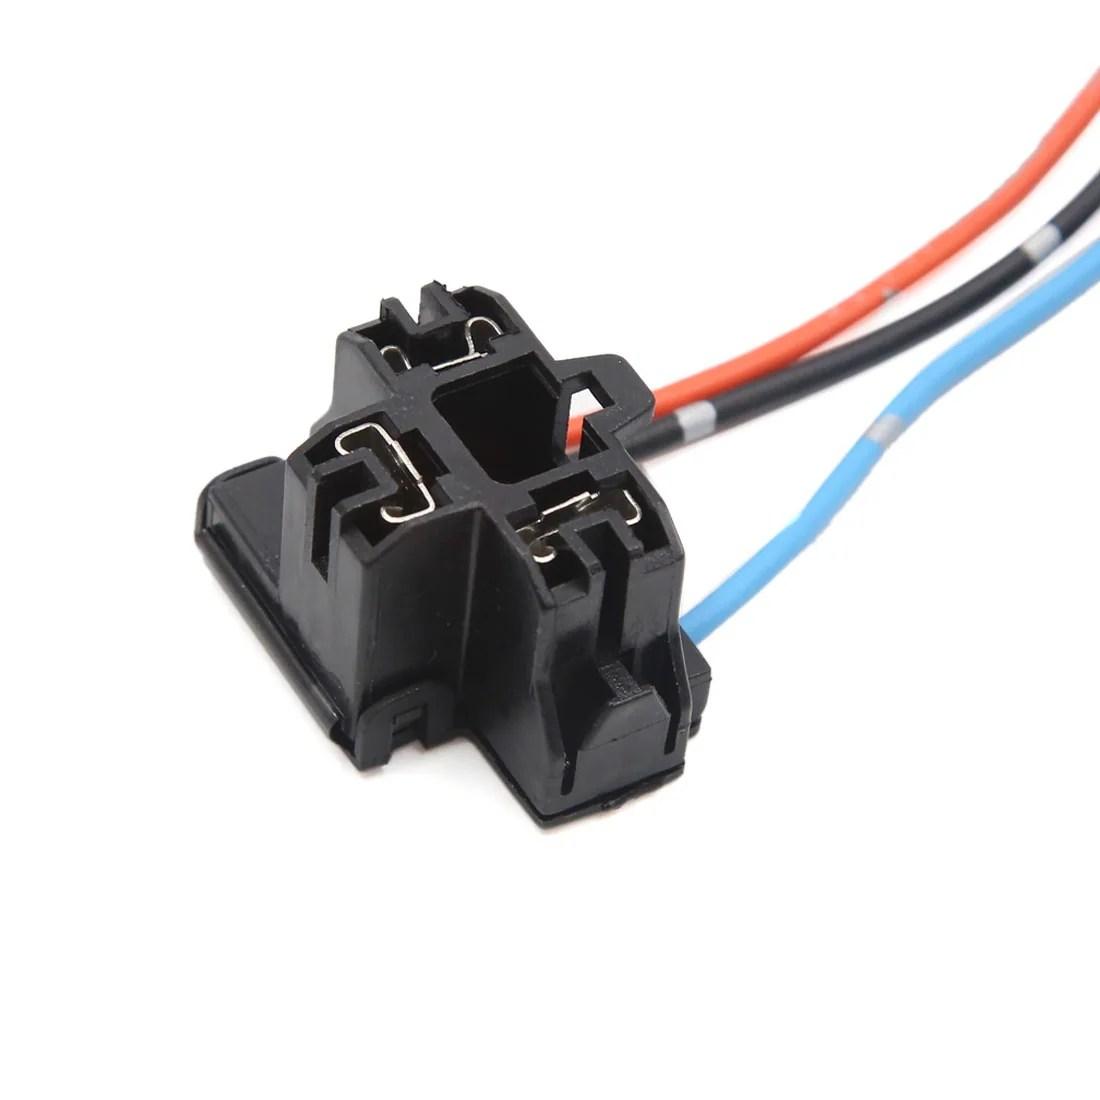 viper 350 hv wiring diagram ac 350hv remote start